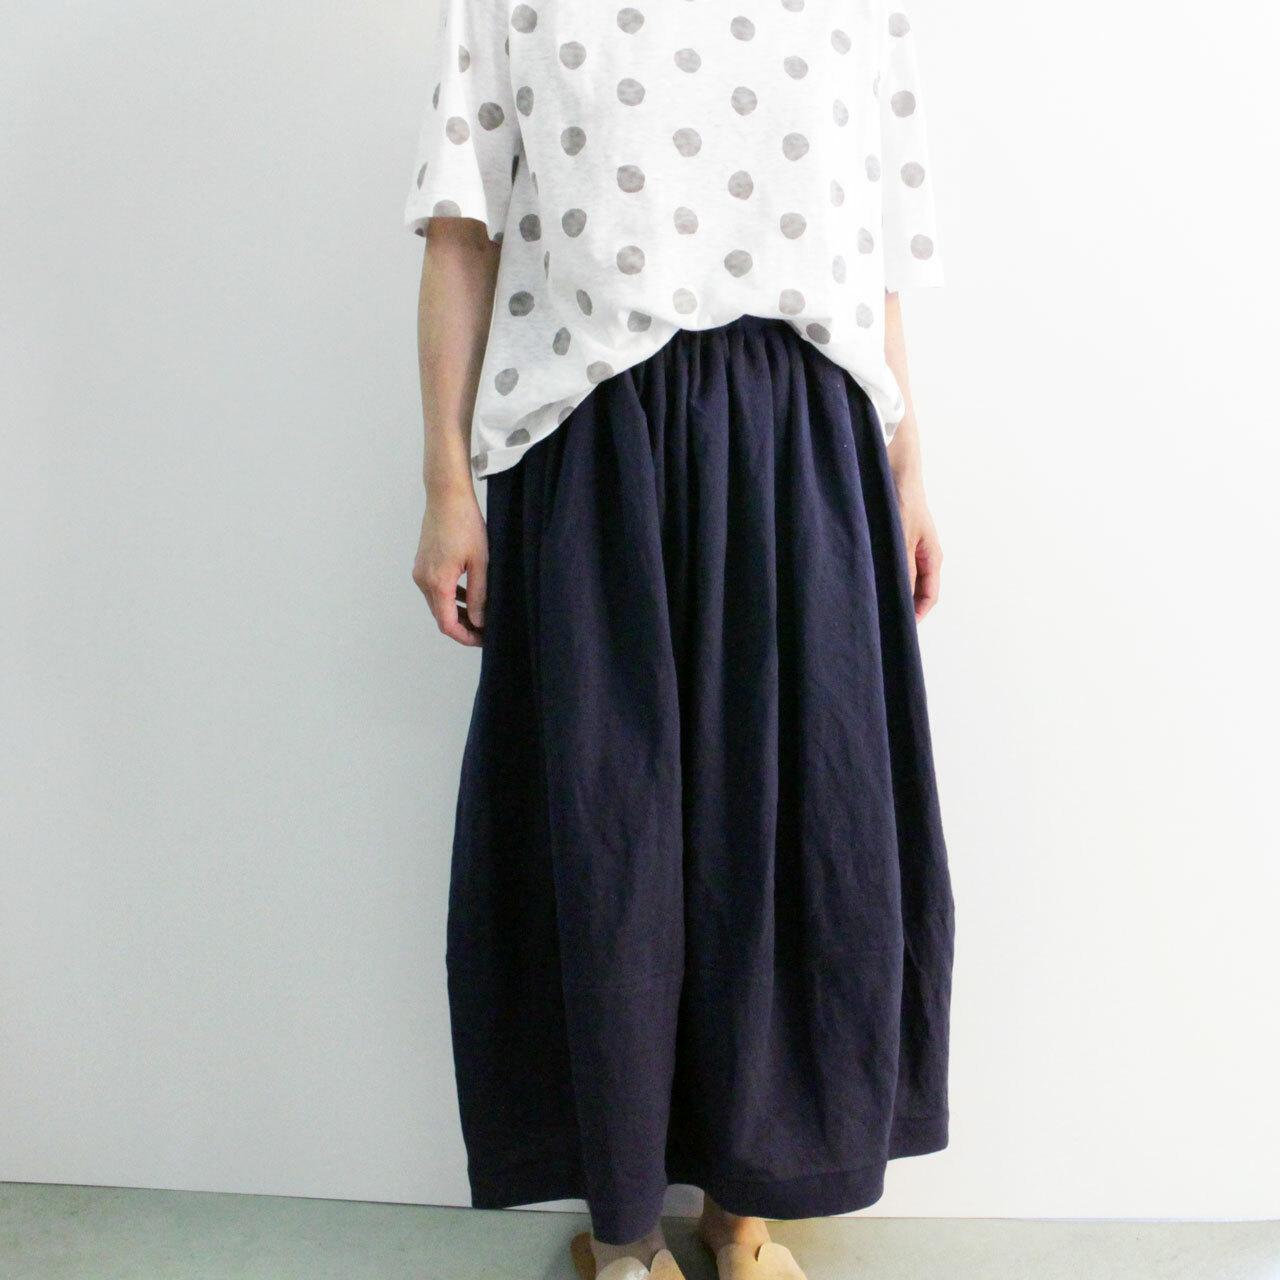 YARRA (ヤラ) YR-92-099 綿麻バルーン風スカート